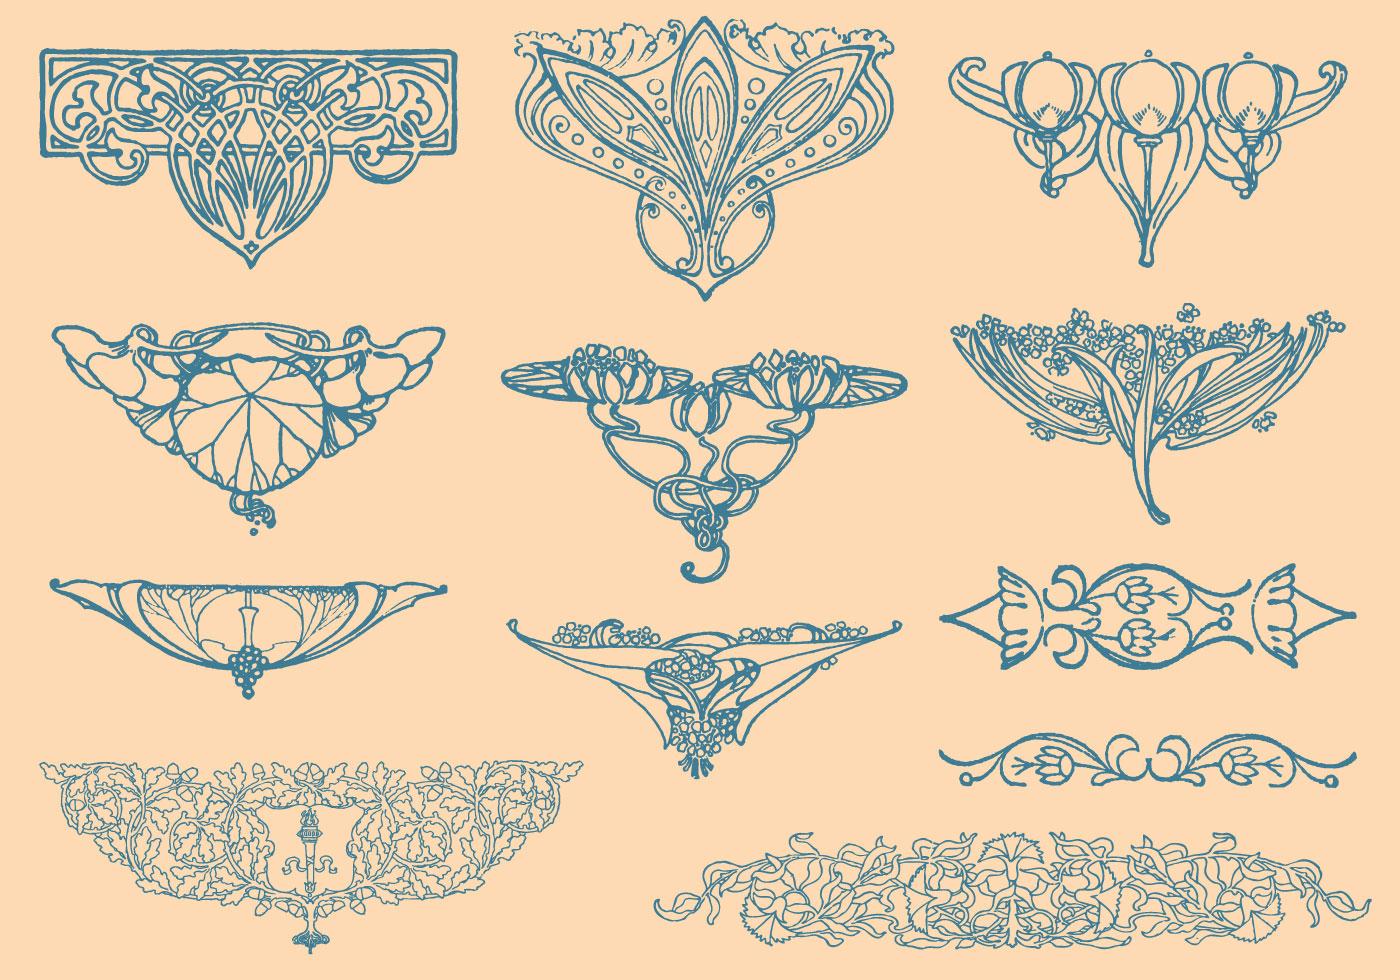 Art nouveau vector elements download free vector art